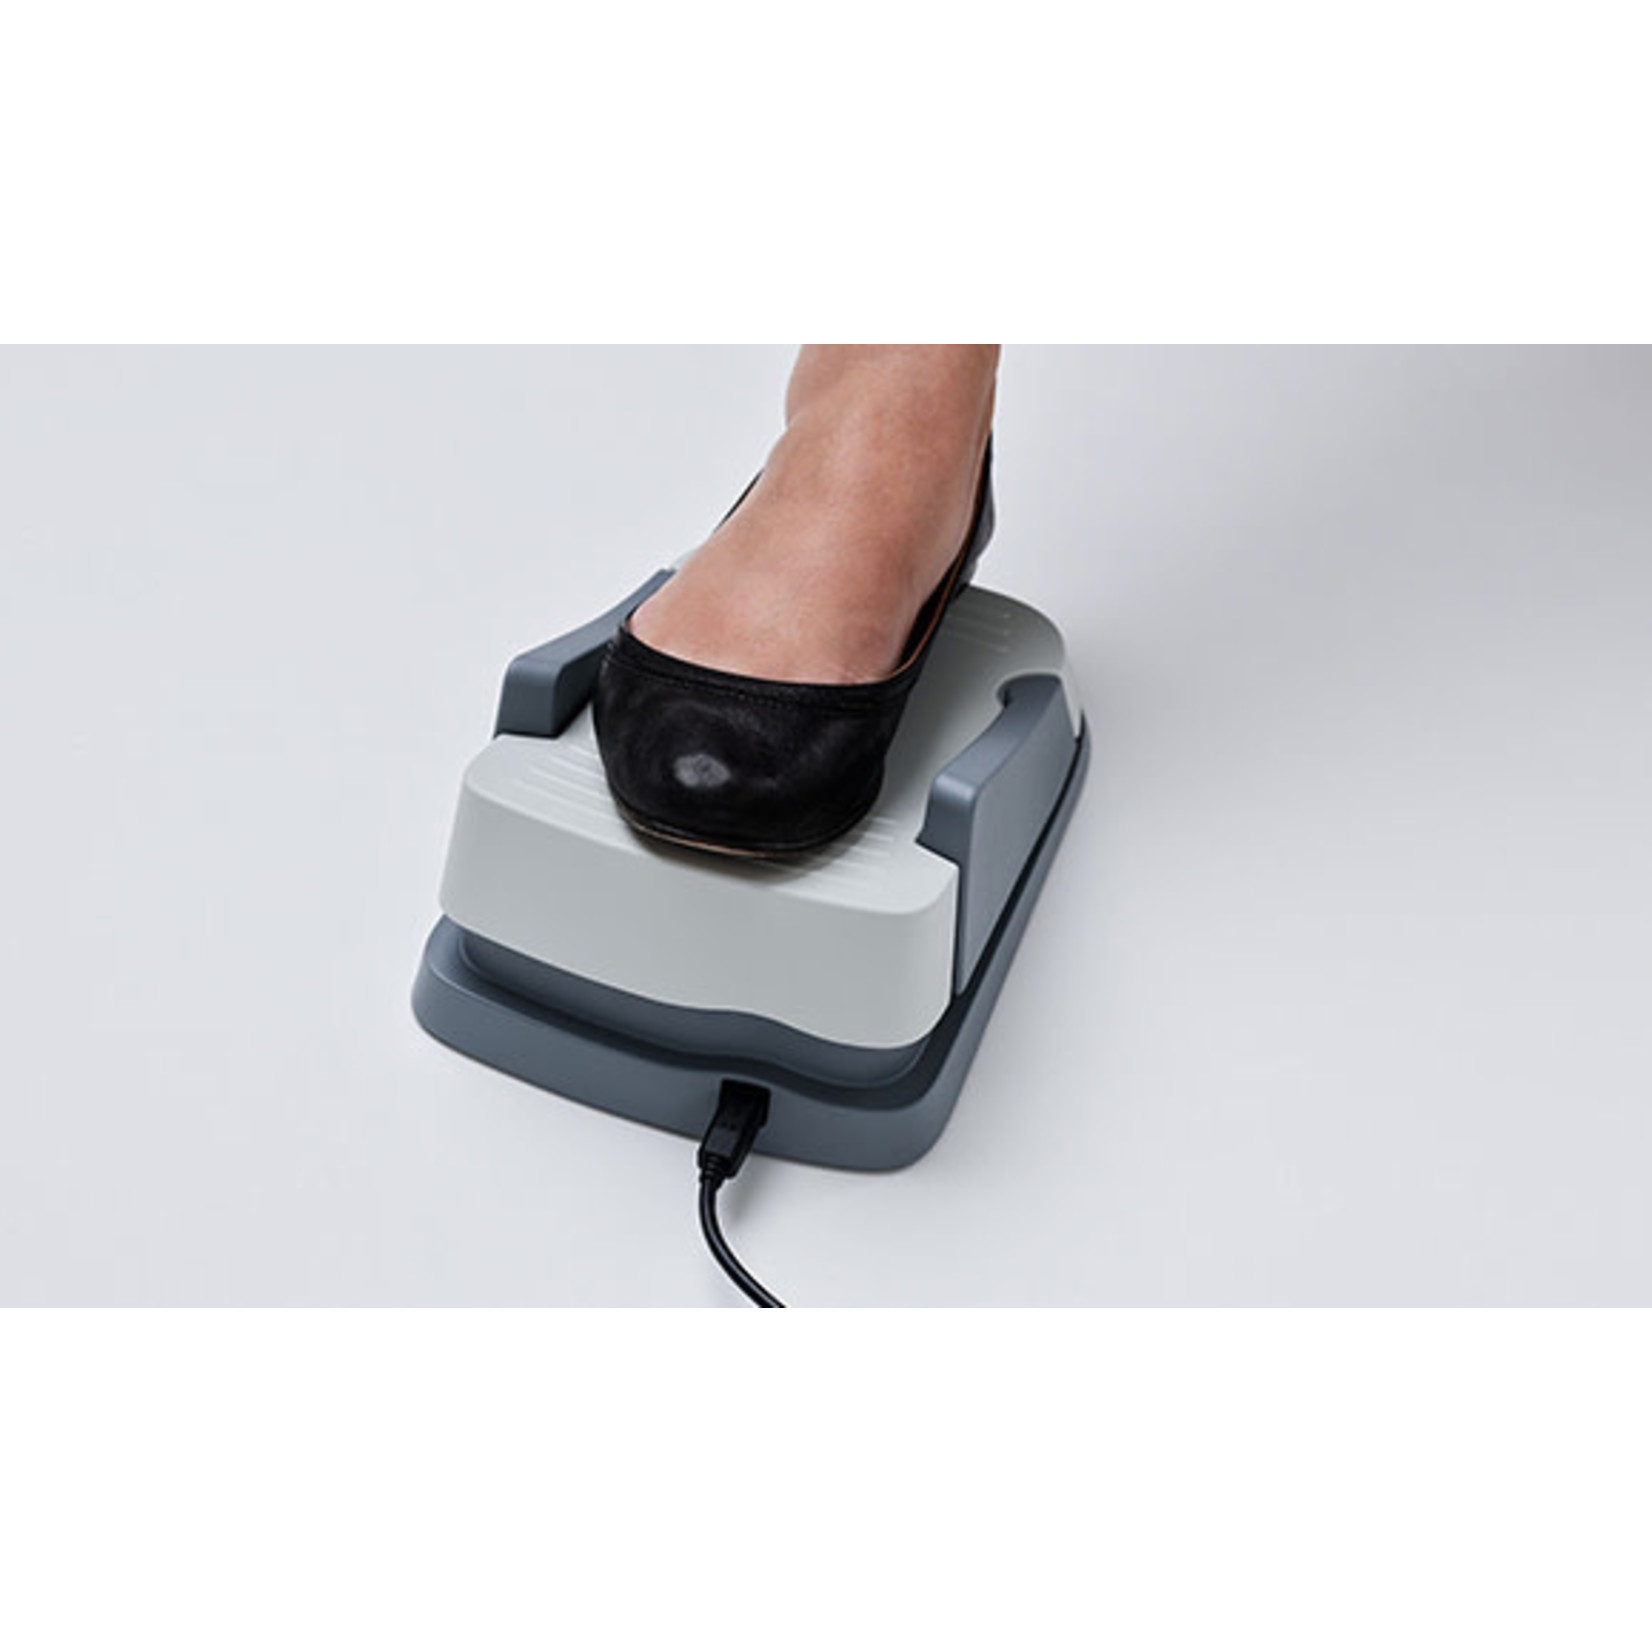 Husqvarna Viking Multifunction Foot Controller - HUSQVARNA VIKING